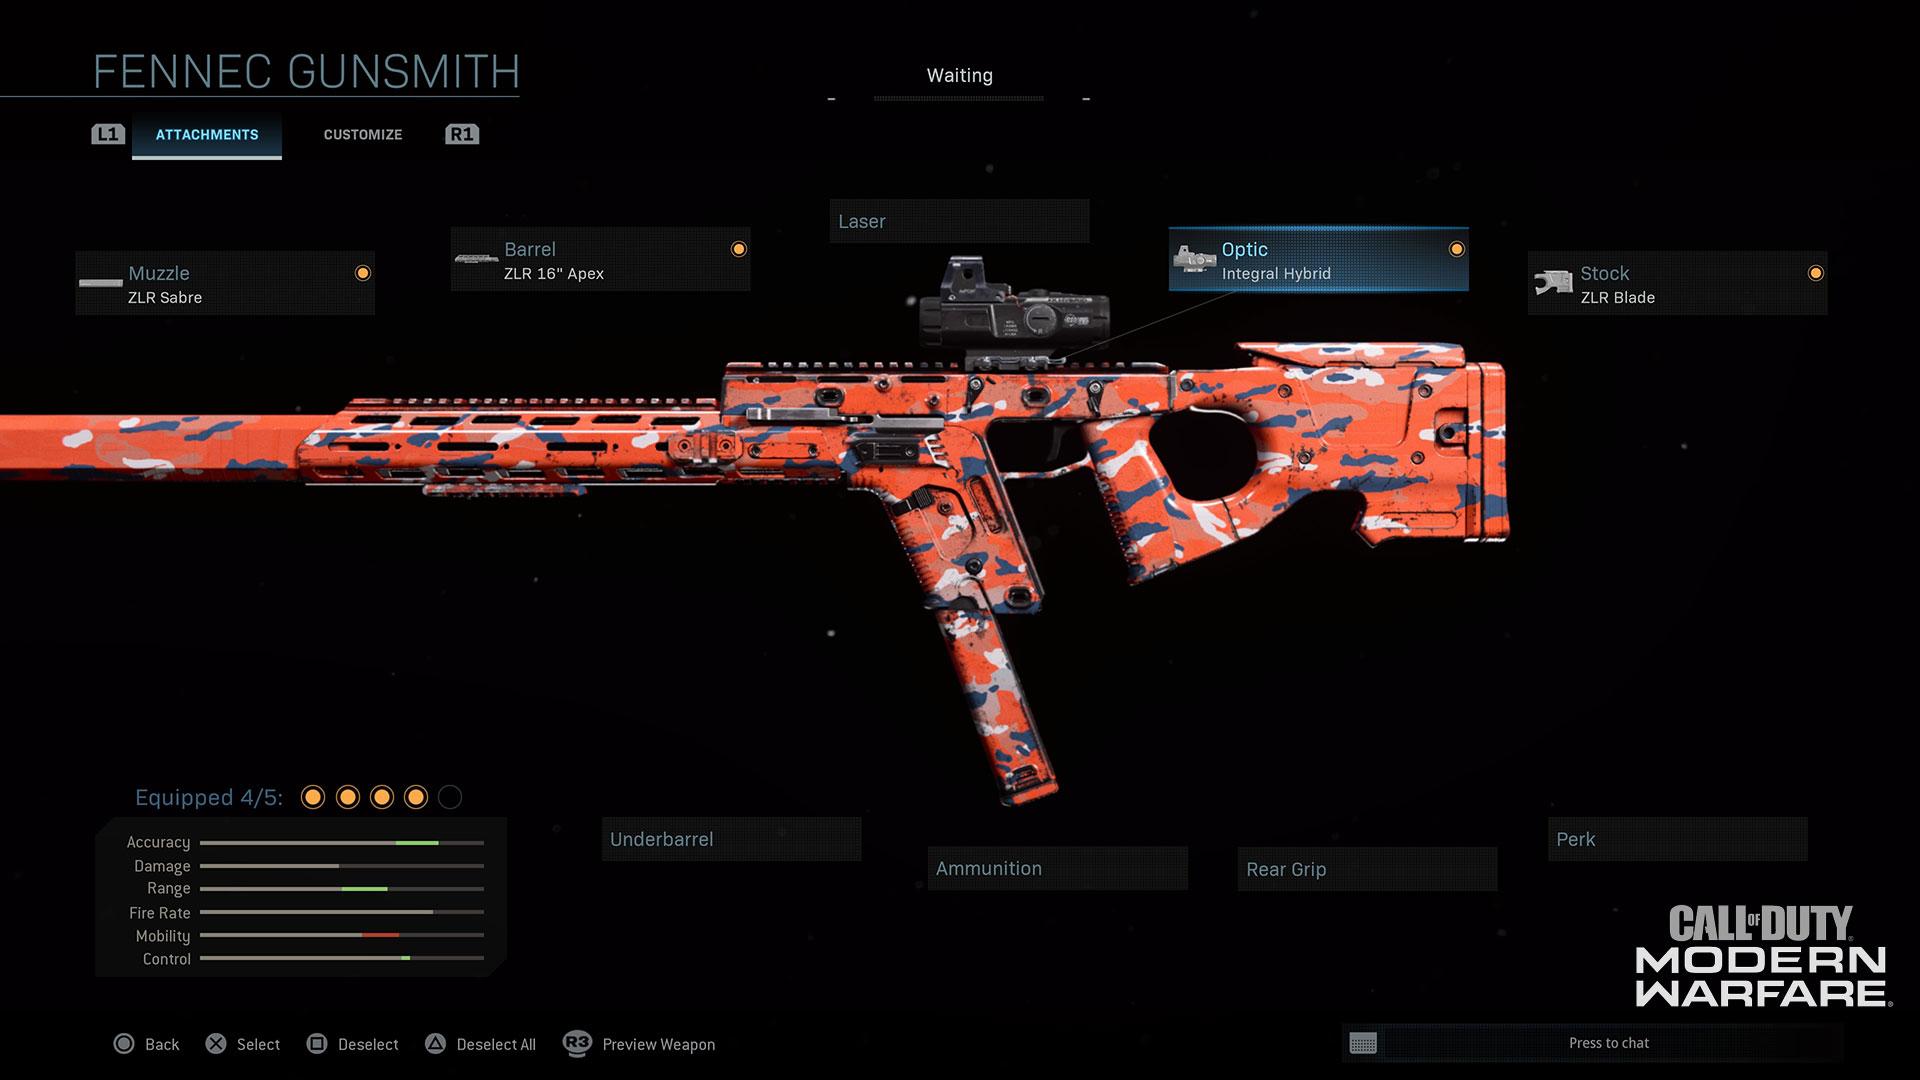 Modern Warfare® Weapon Detail: Fennec - Image 3